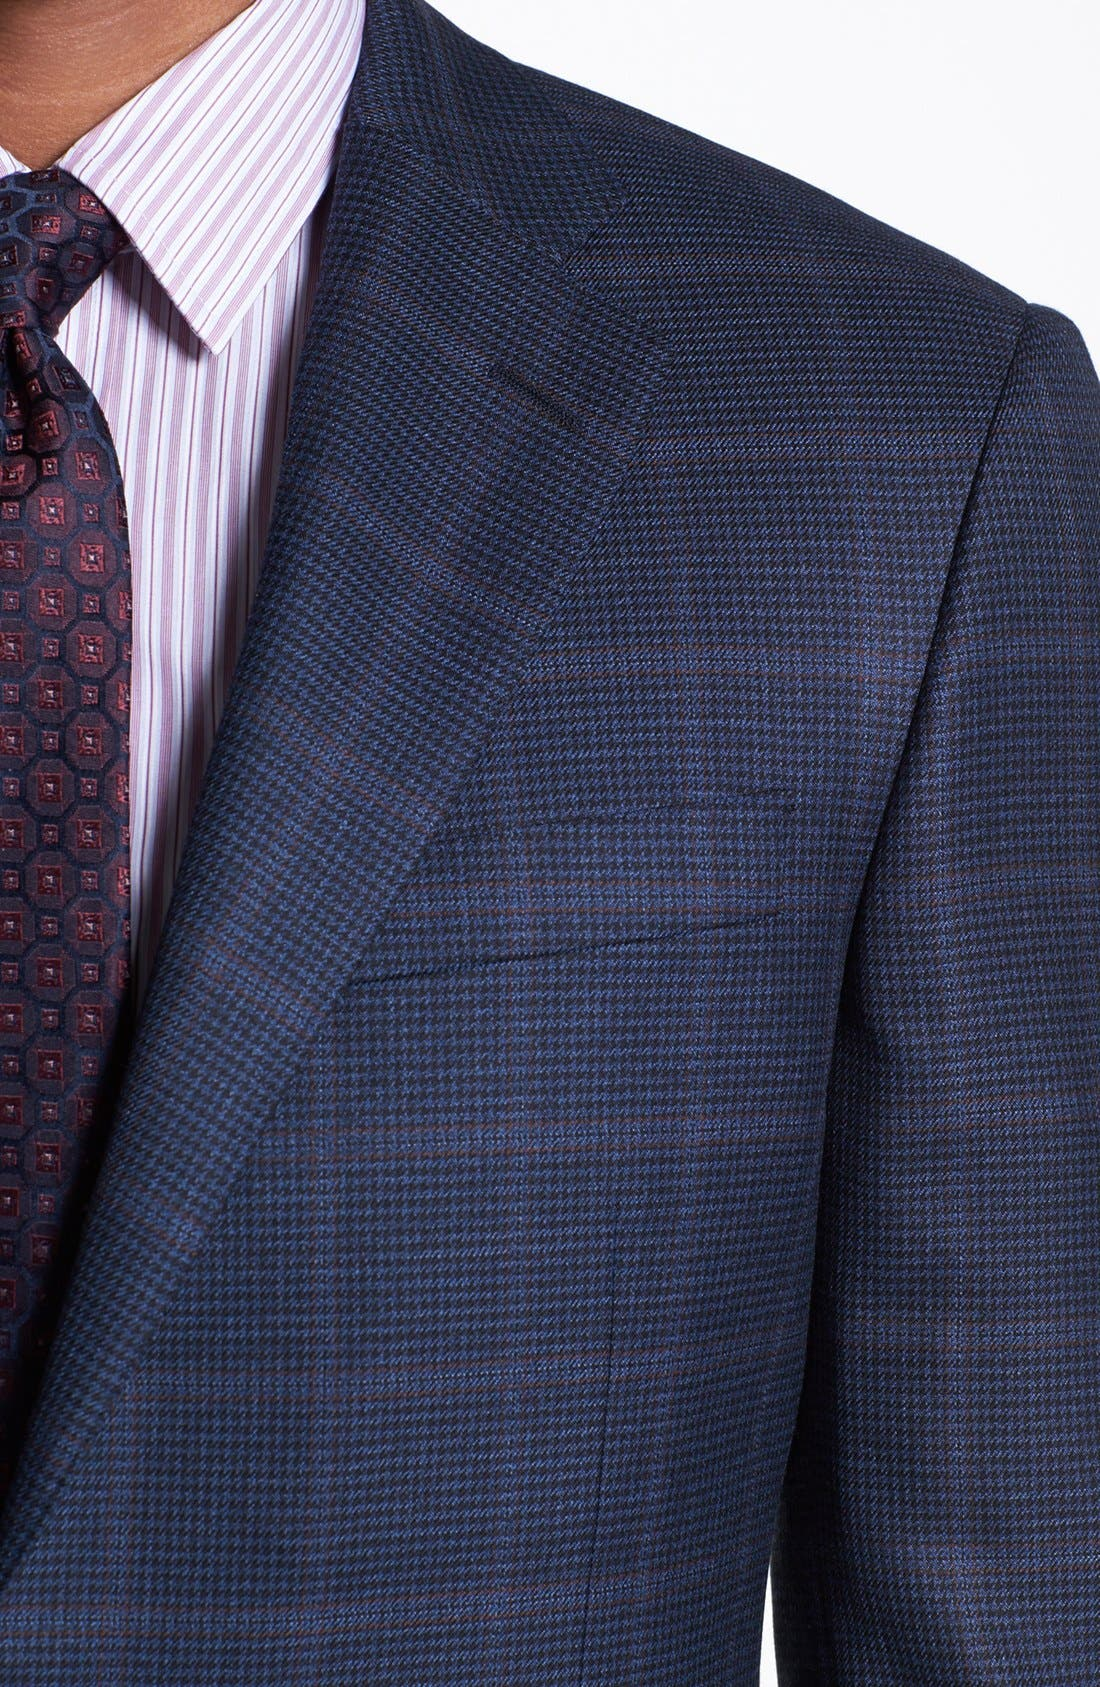 Alternate Image 2  - Hickey Freeman 'B Series' Plaid Wool Sportcoat